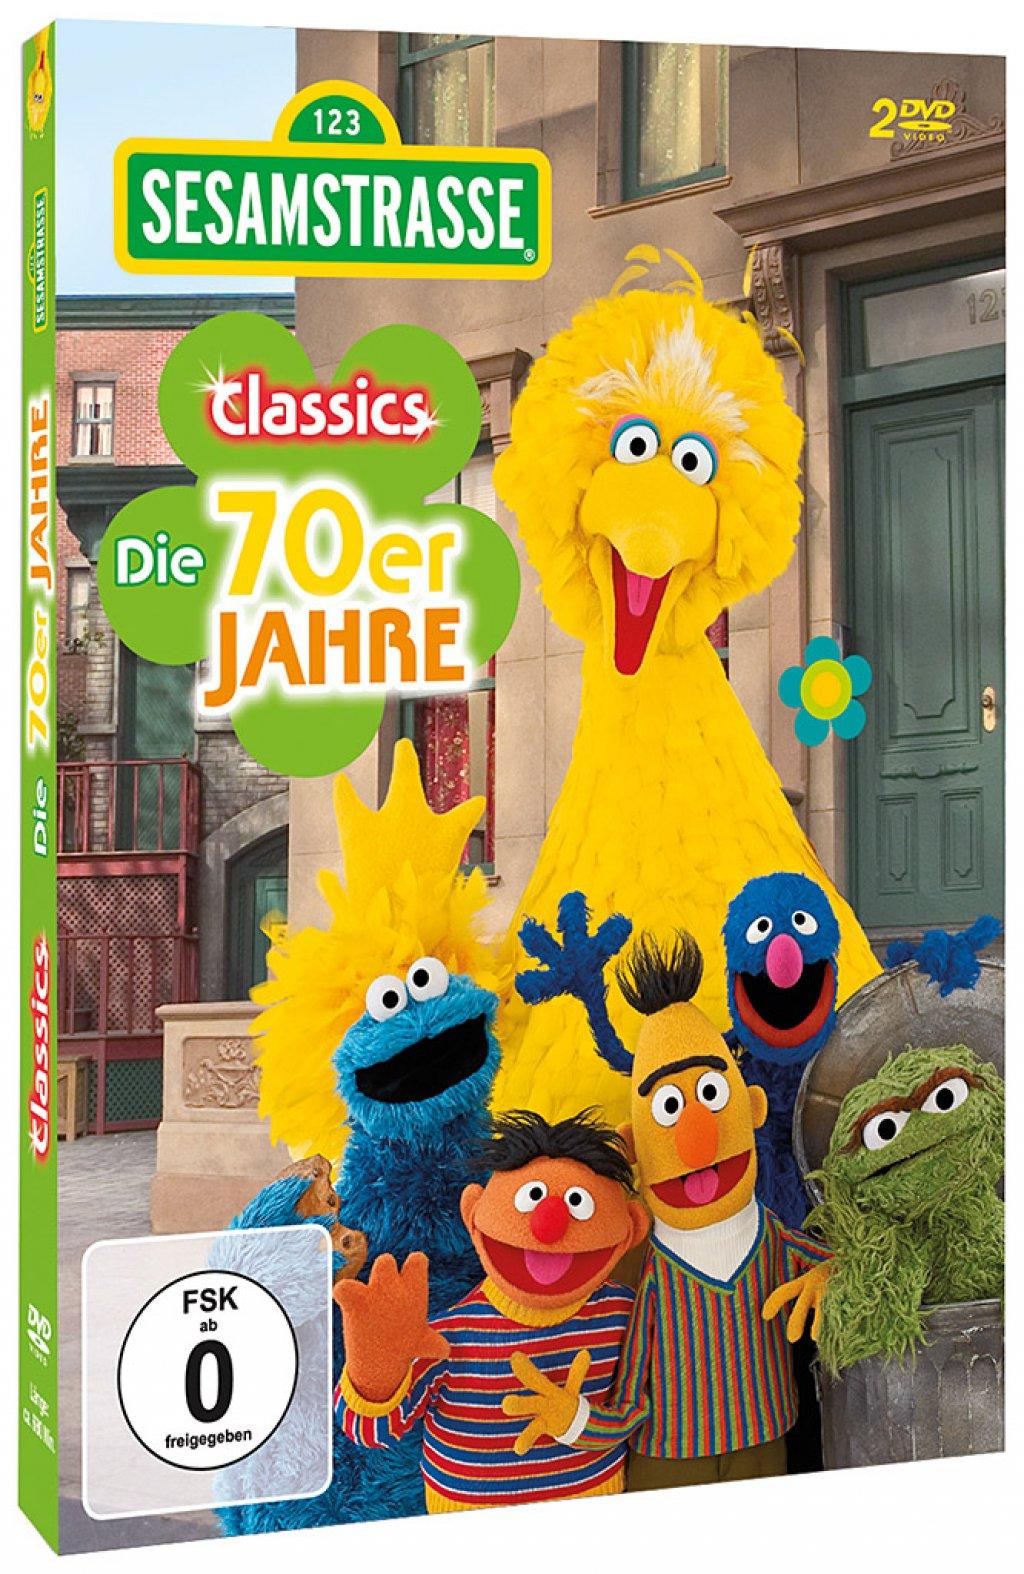 34f62e4e85 Sesamstraße Classics - Die 70er Jahre # 2-DVD-NEU | eBay